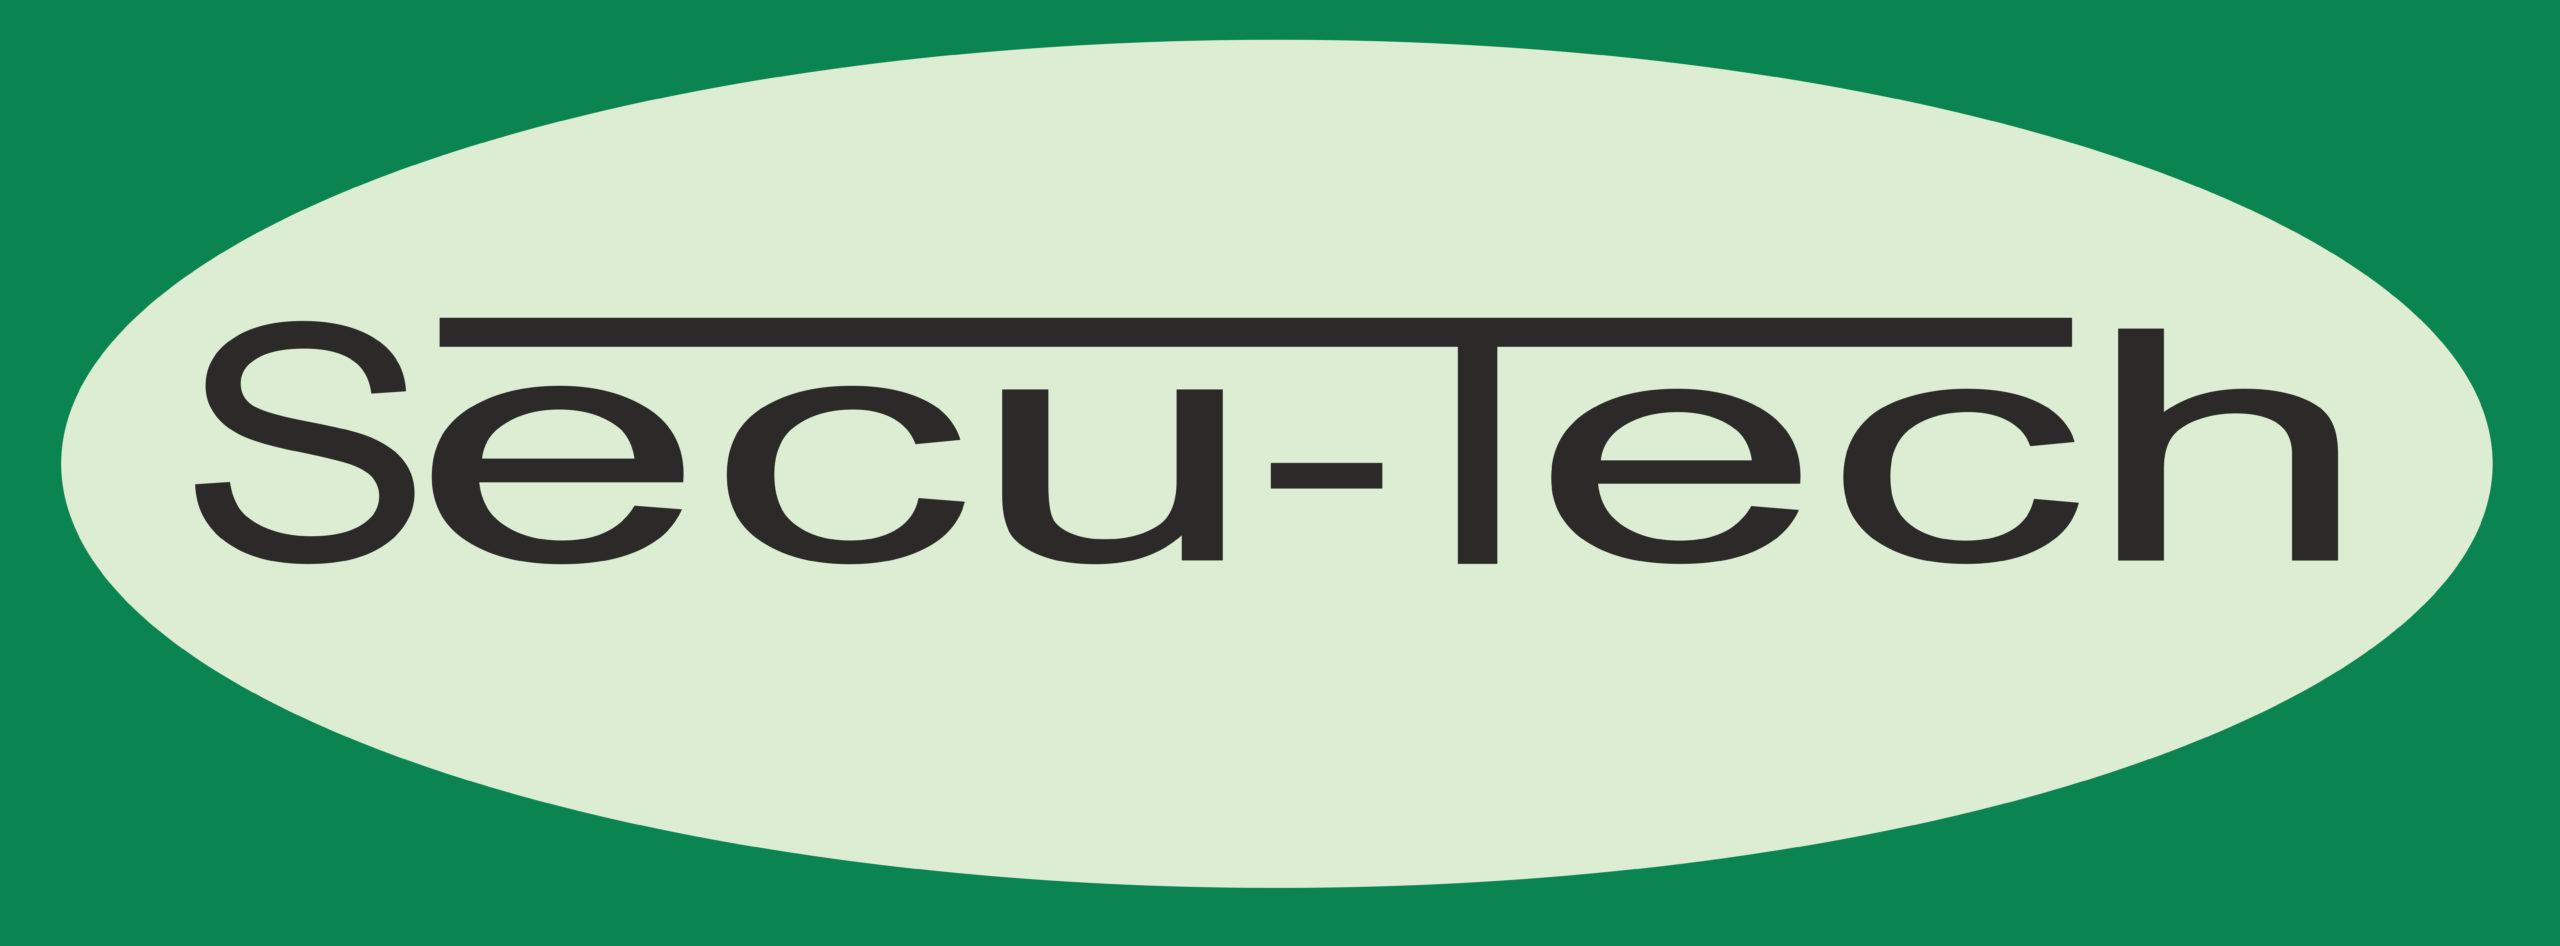 Secu-Tech логотип